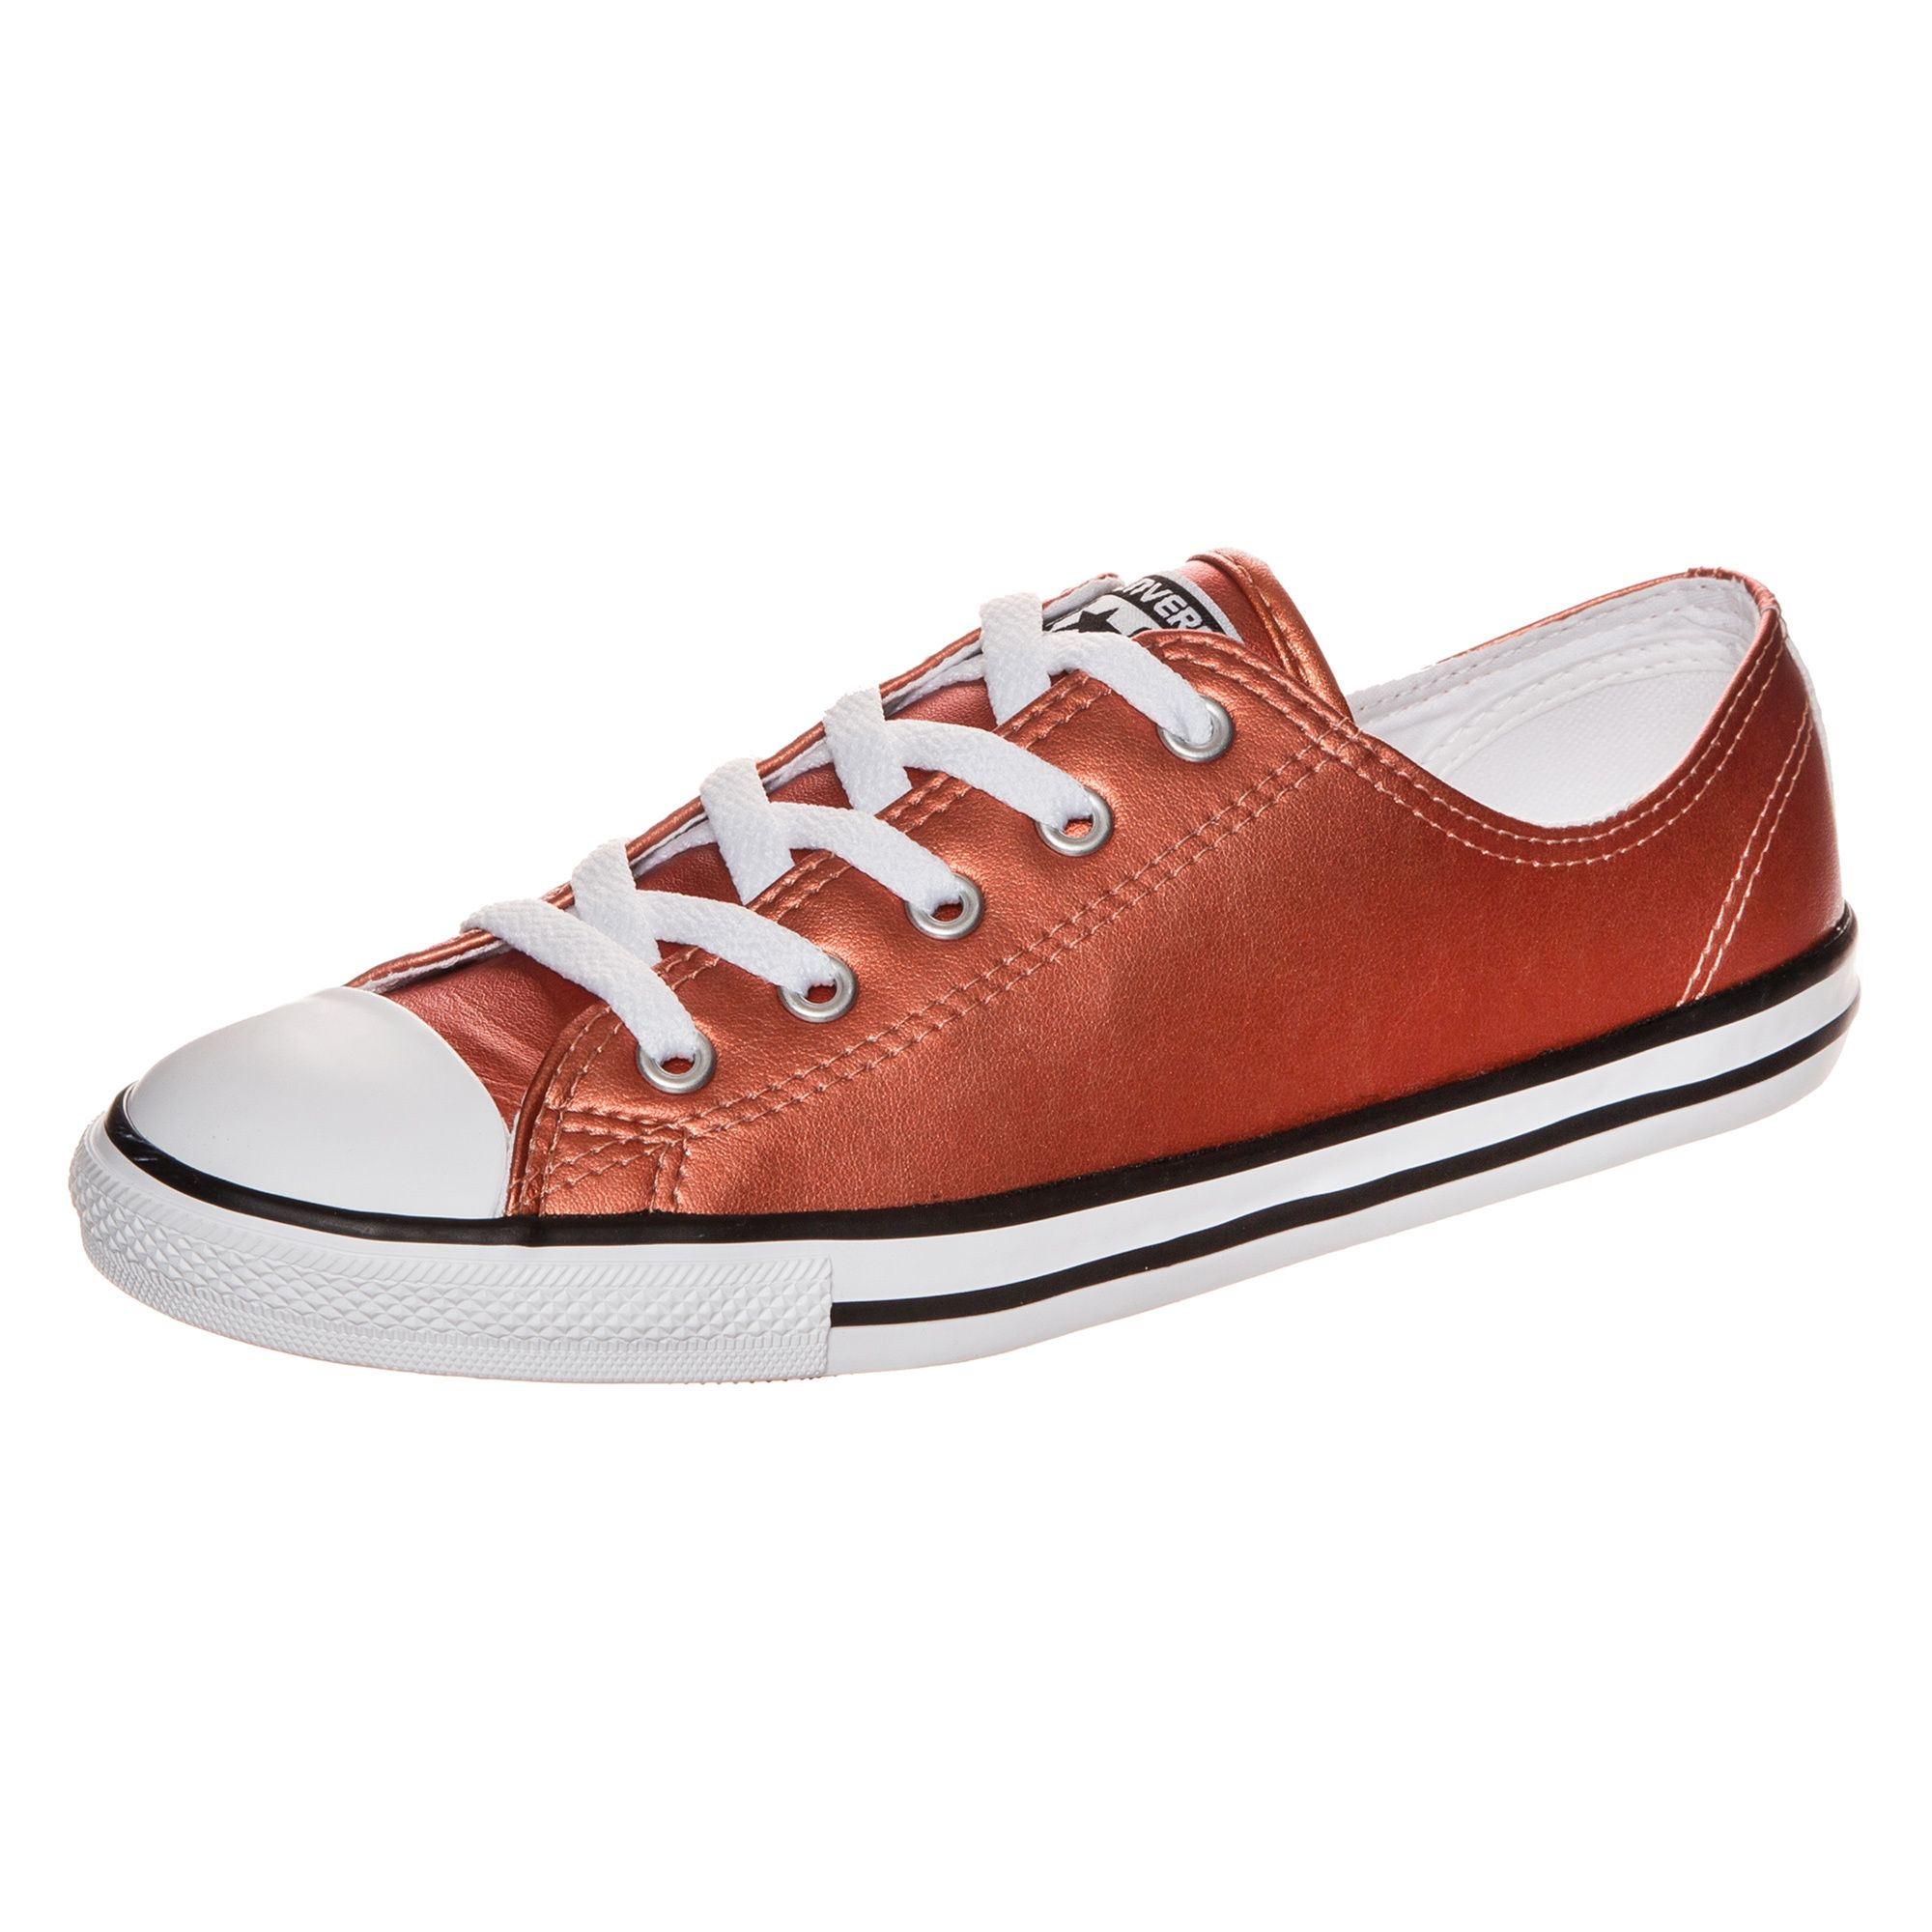 CONVERSE Converse Chuck Taylor All Star Dainty Metallic OX Sneaker Damen